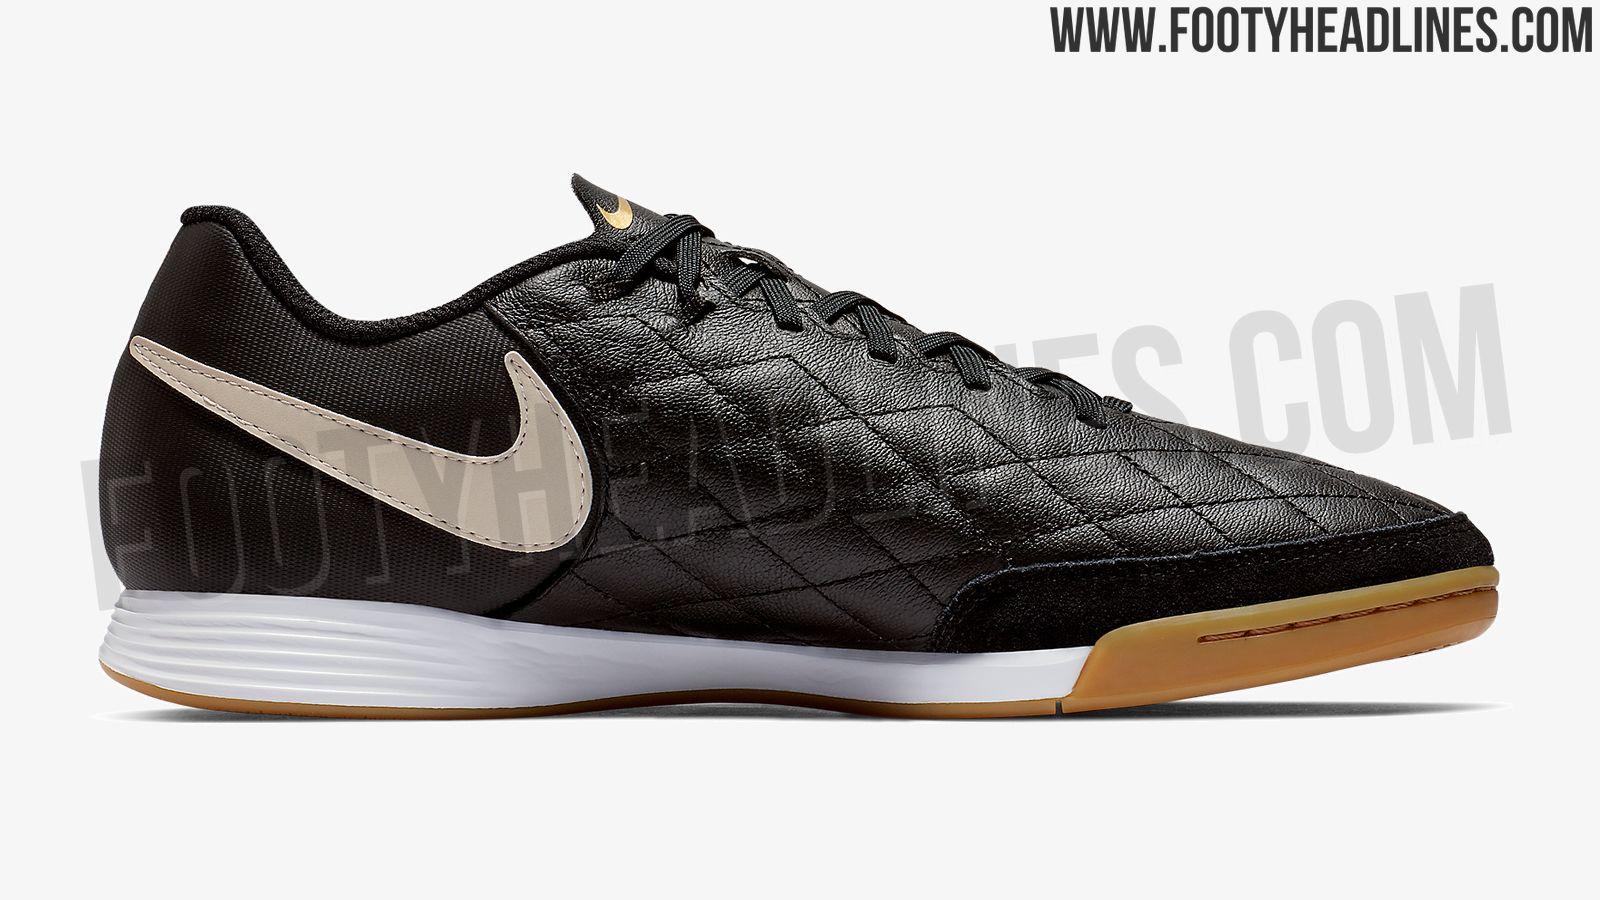 size 40 f910e a484e Stunning Black Nike Tiempo Ronaldinho 2019 Boots Leaked ...